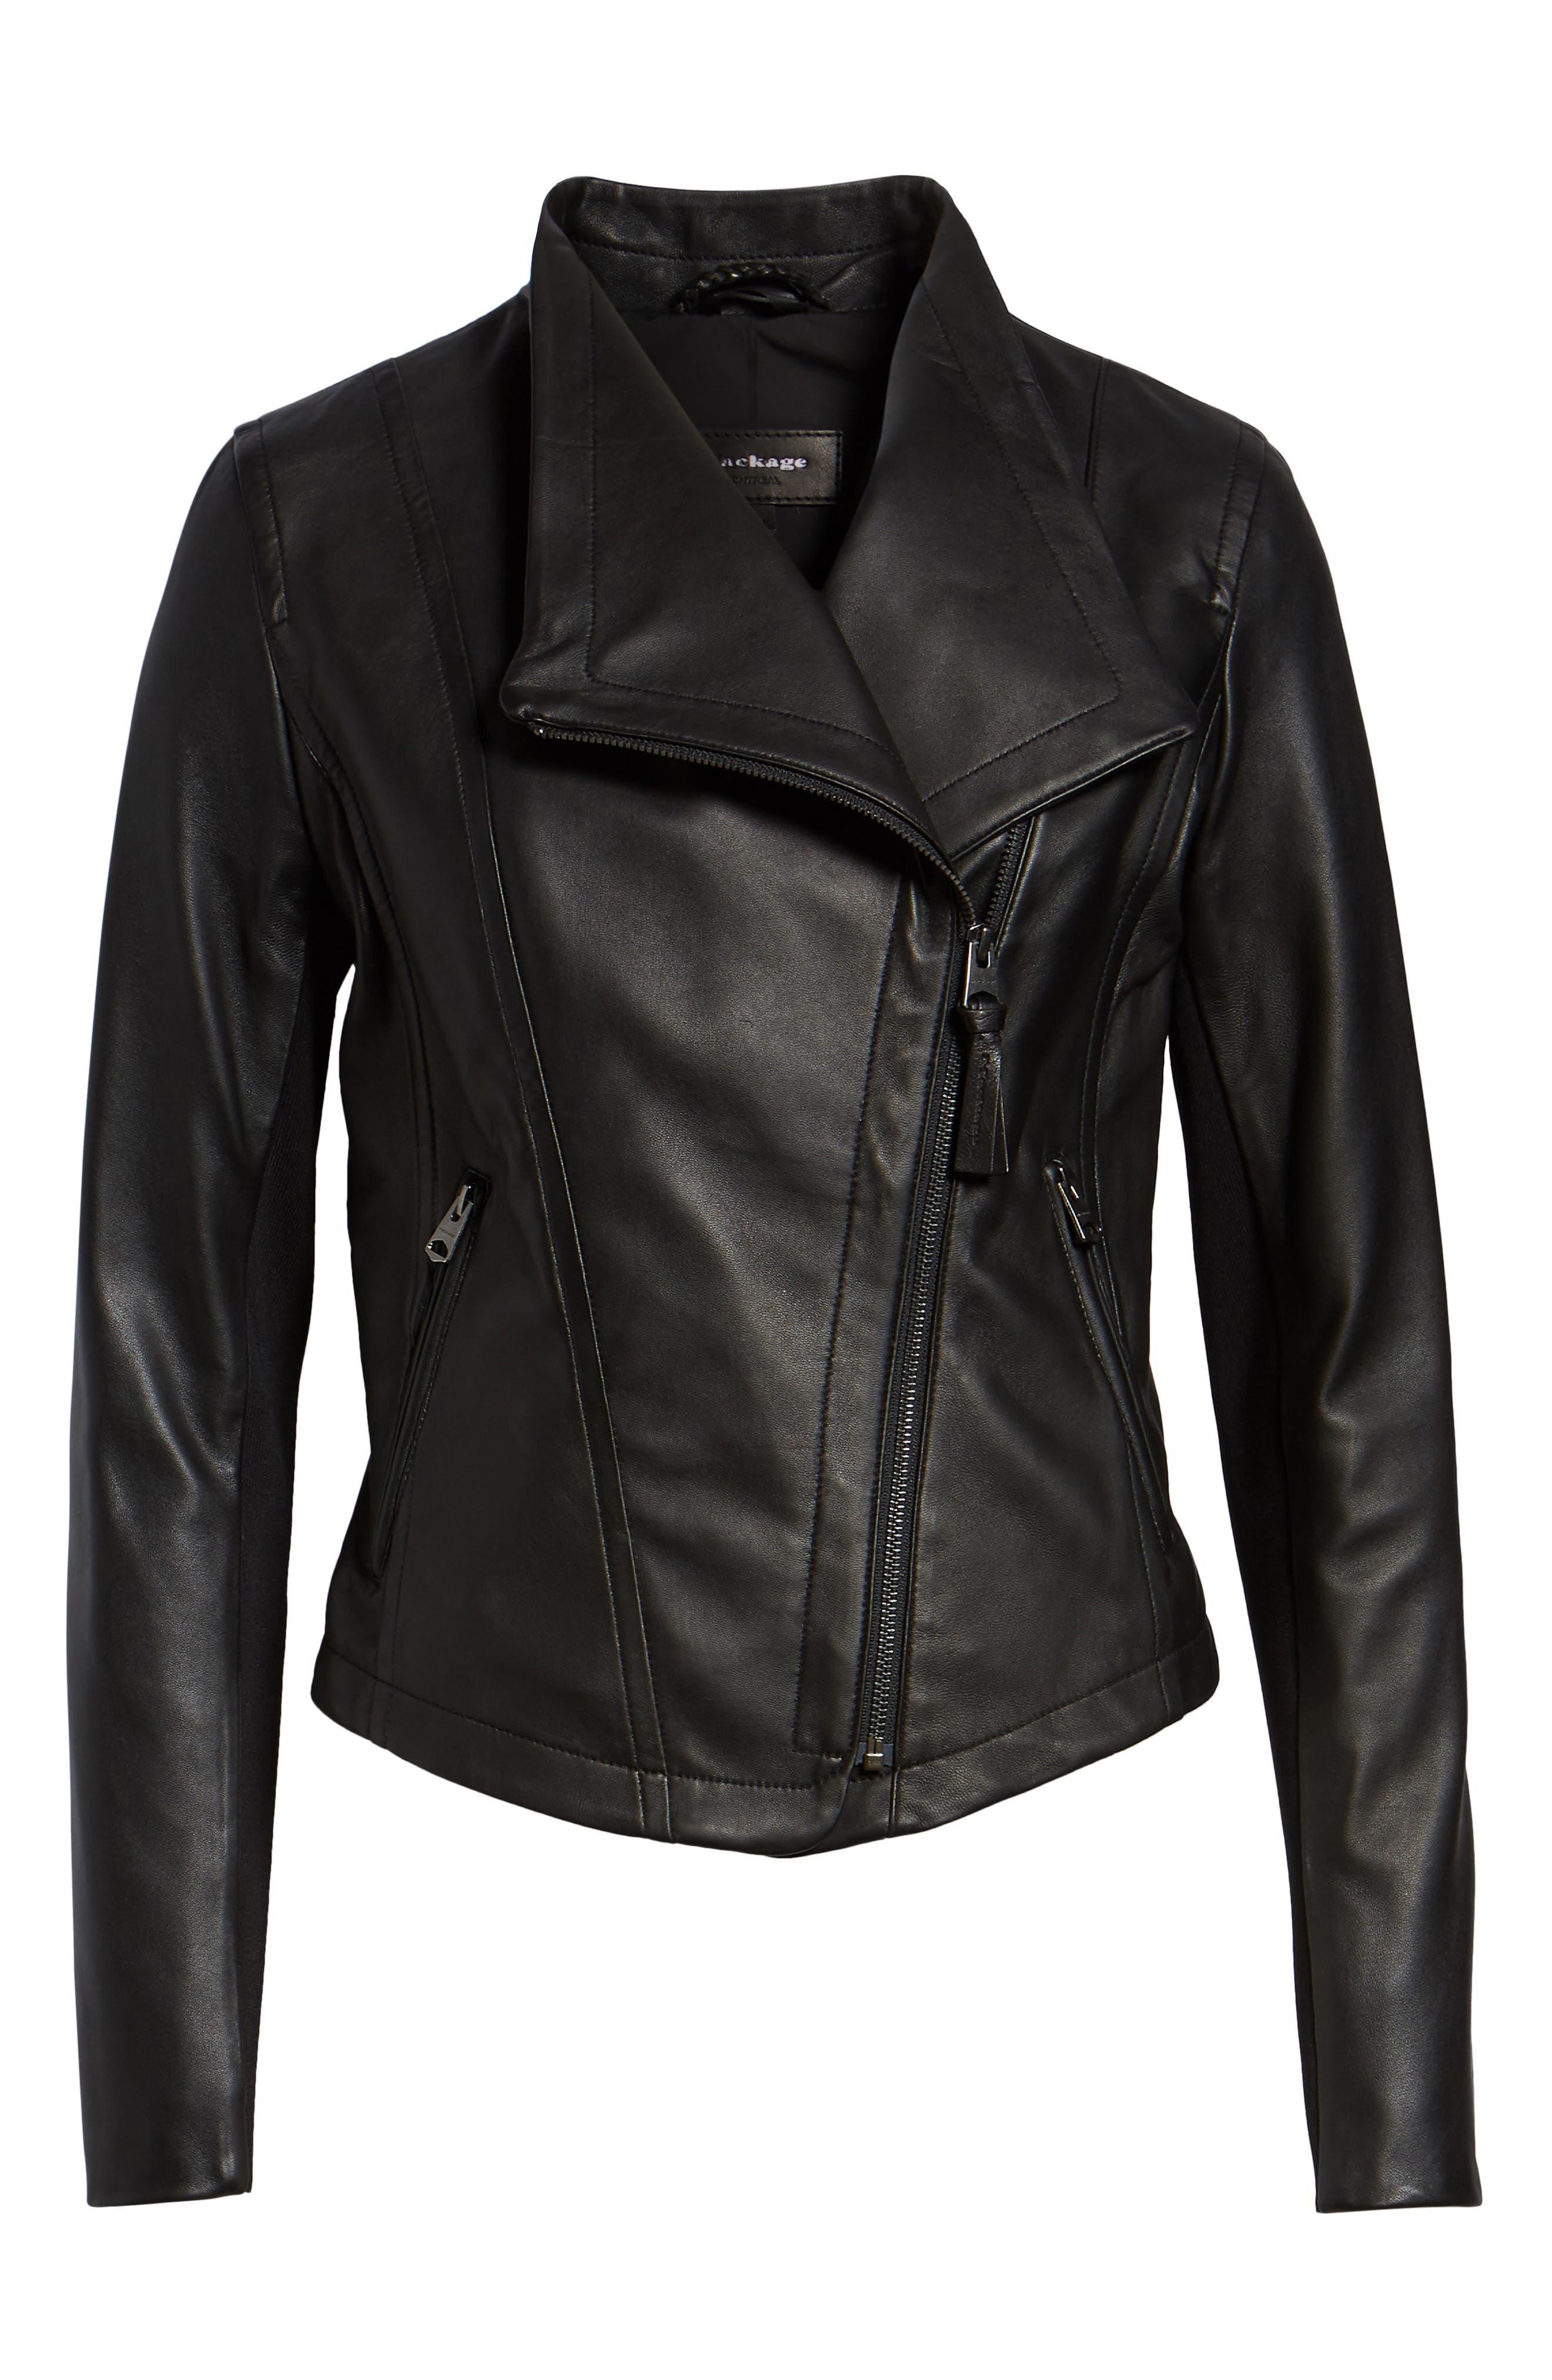 MACKAGE,                             Pina-L Leather Moto Jacket,                             Alternate thumbnail 5, color,                             001